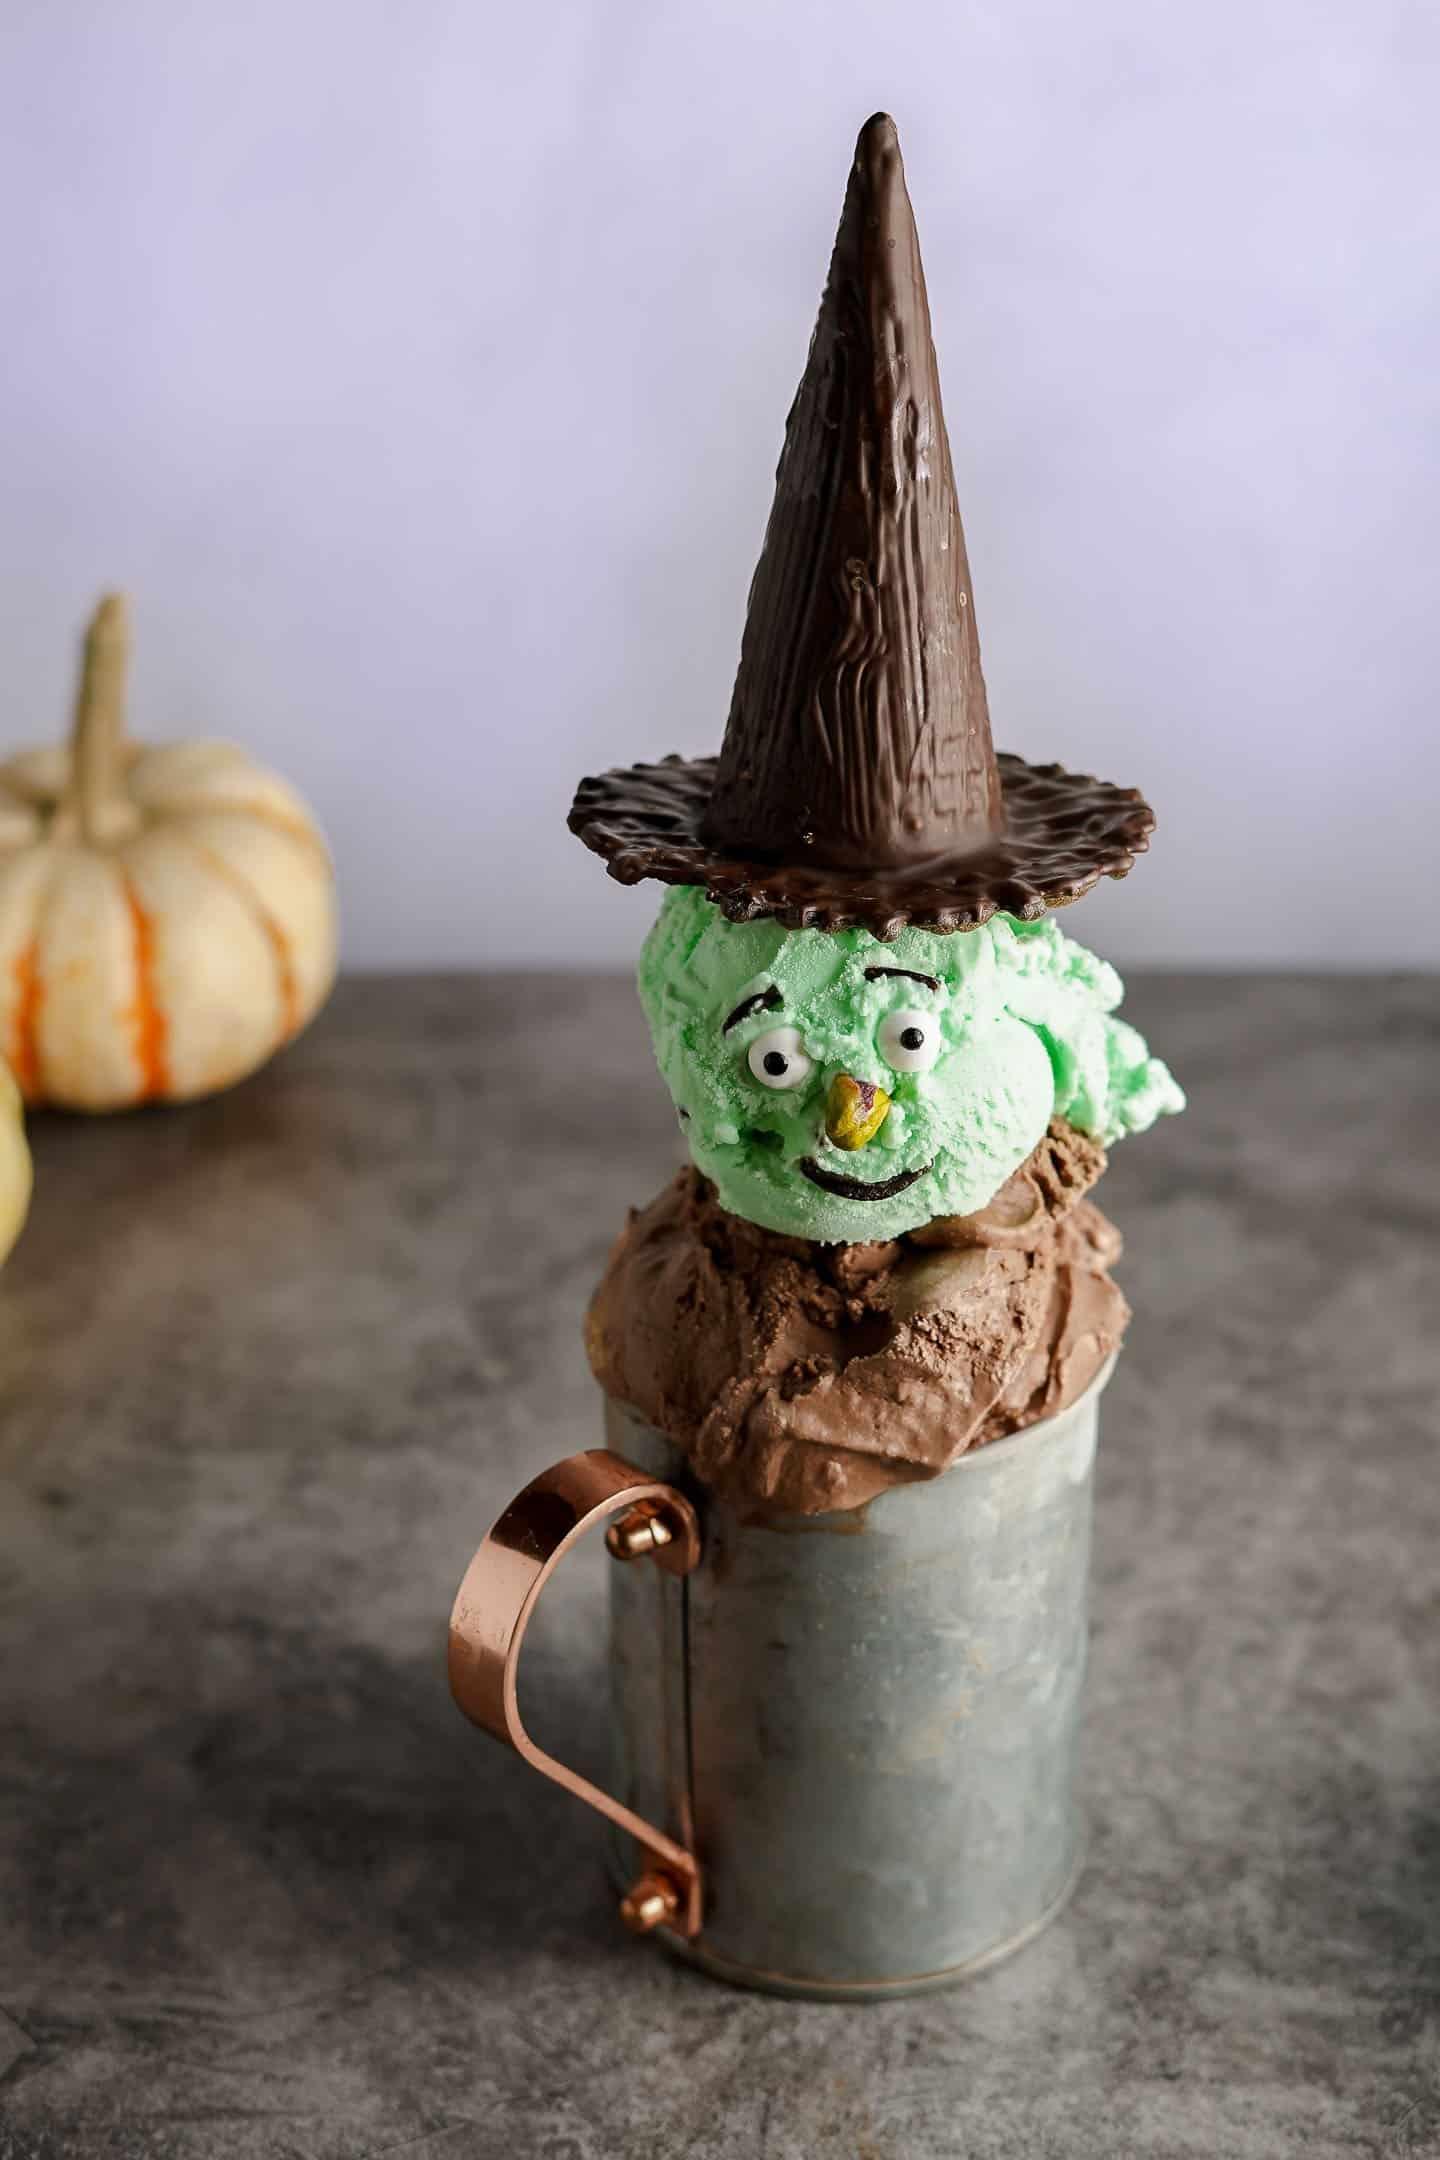 Halloween Ice Cream Sundae with pumpkin in the background